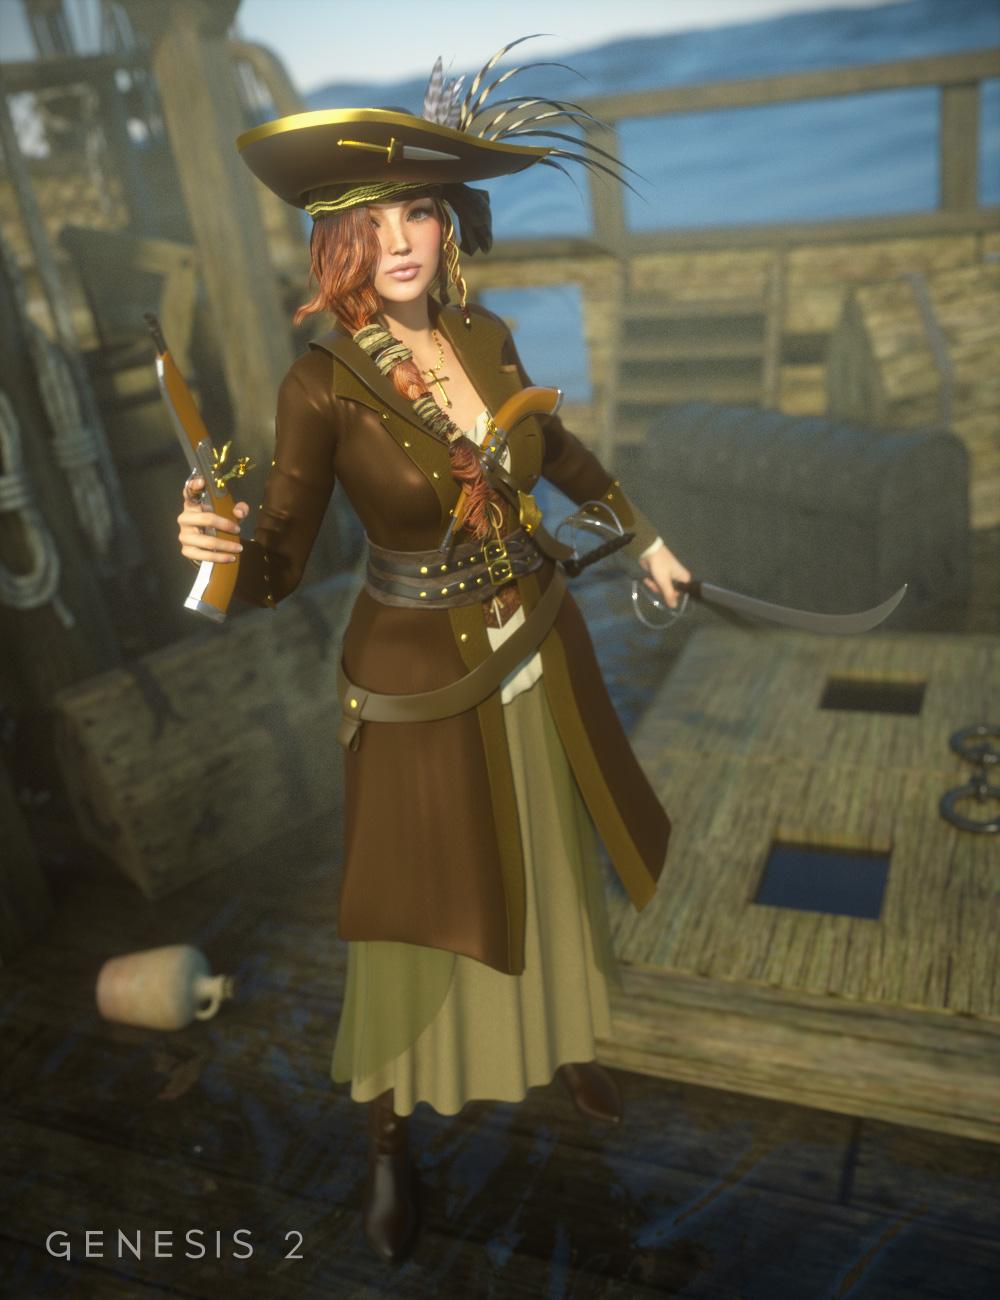 Piratess for Genesis 2 Female(s) by: Ravenhair, 3D Models by Daz 3D